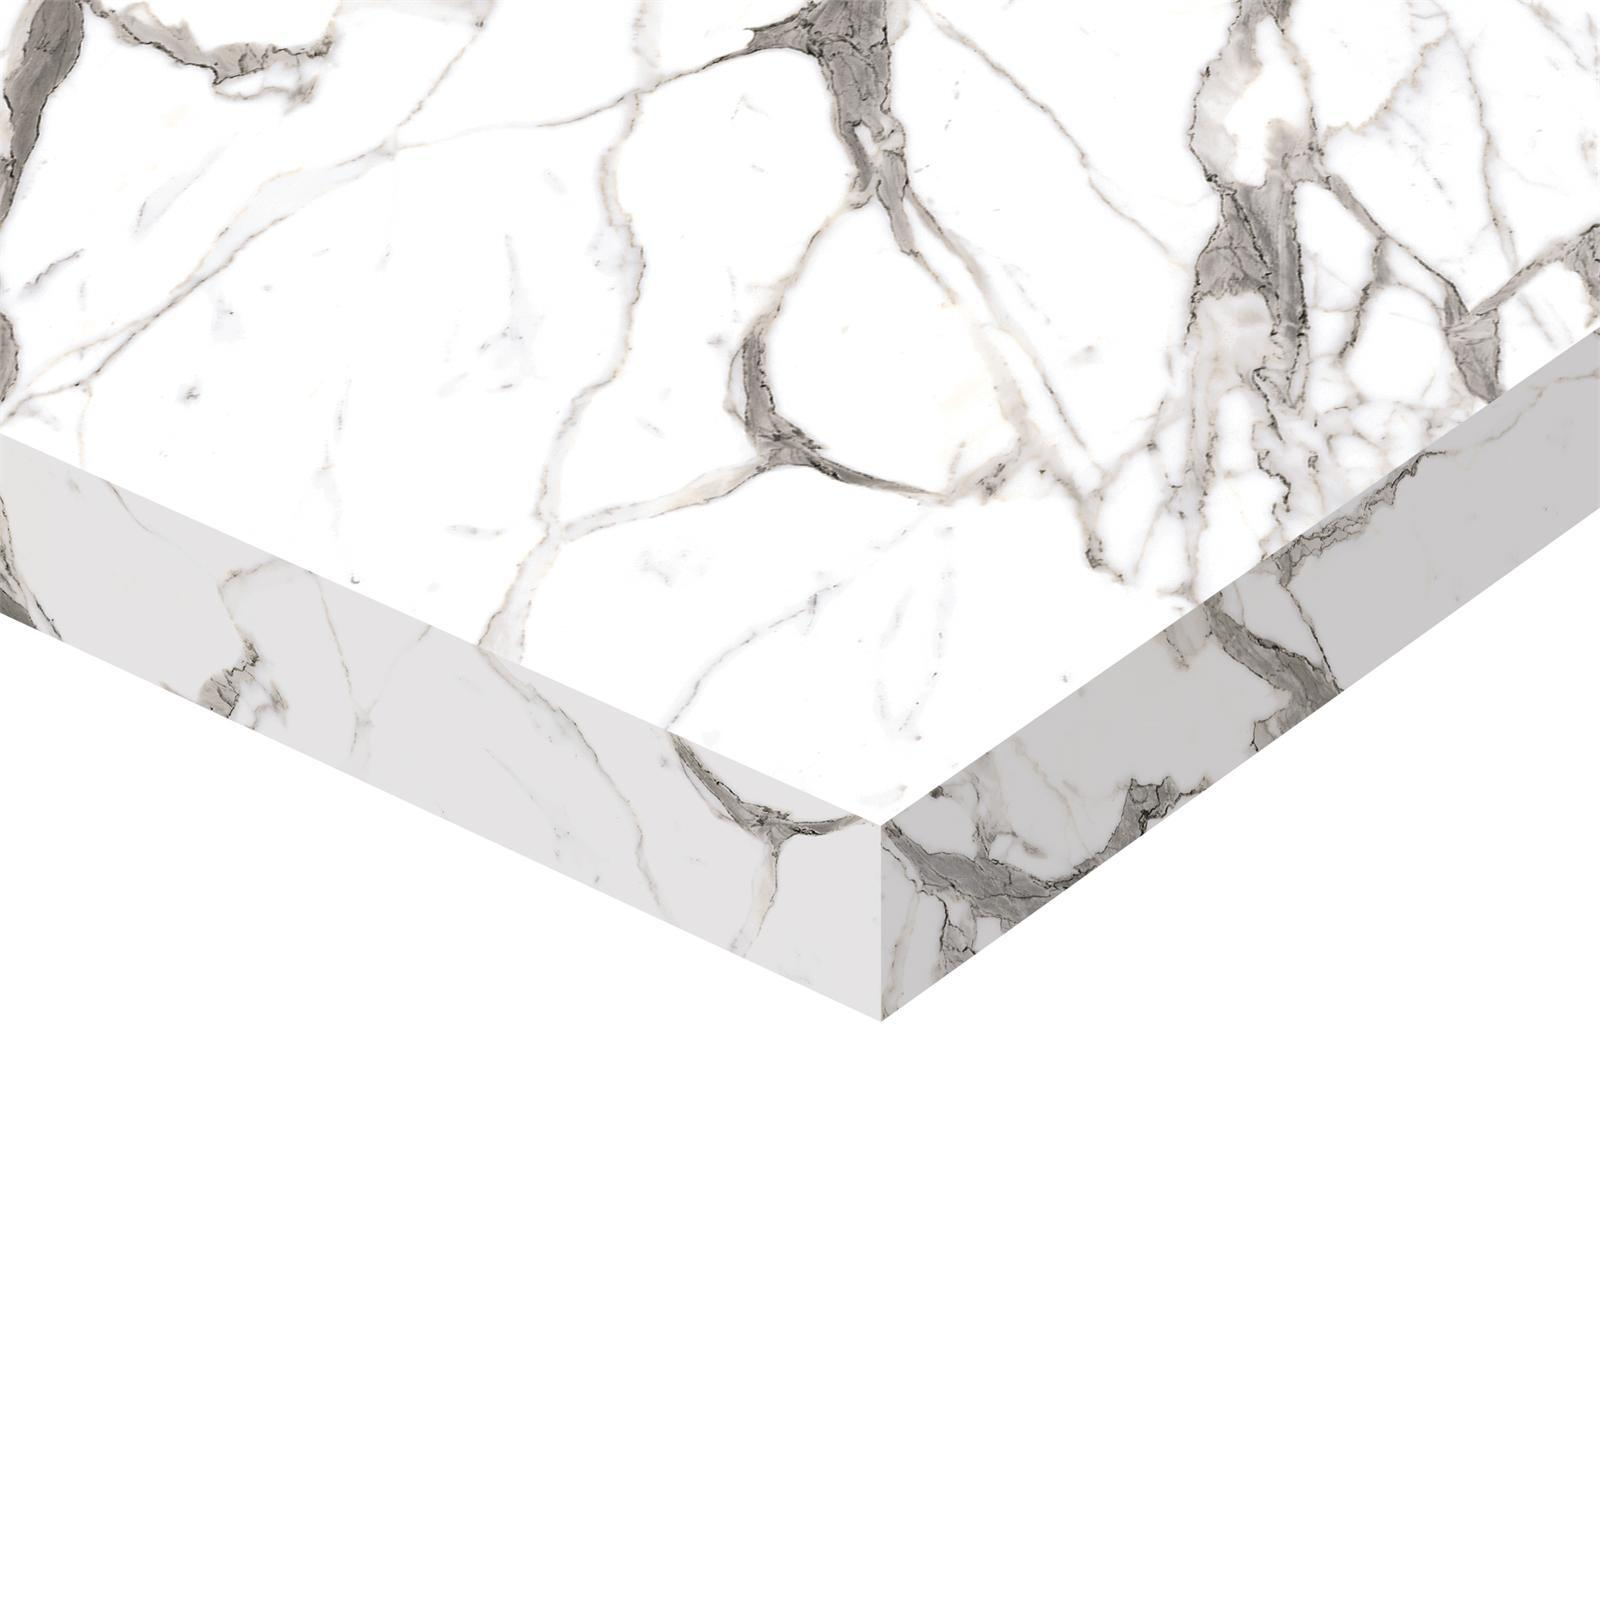 Kaboodle 20 x 300 - 600mm Single Calcutta Gloss Square Edge Benchtop